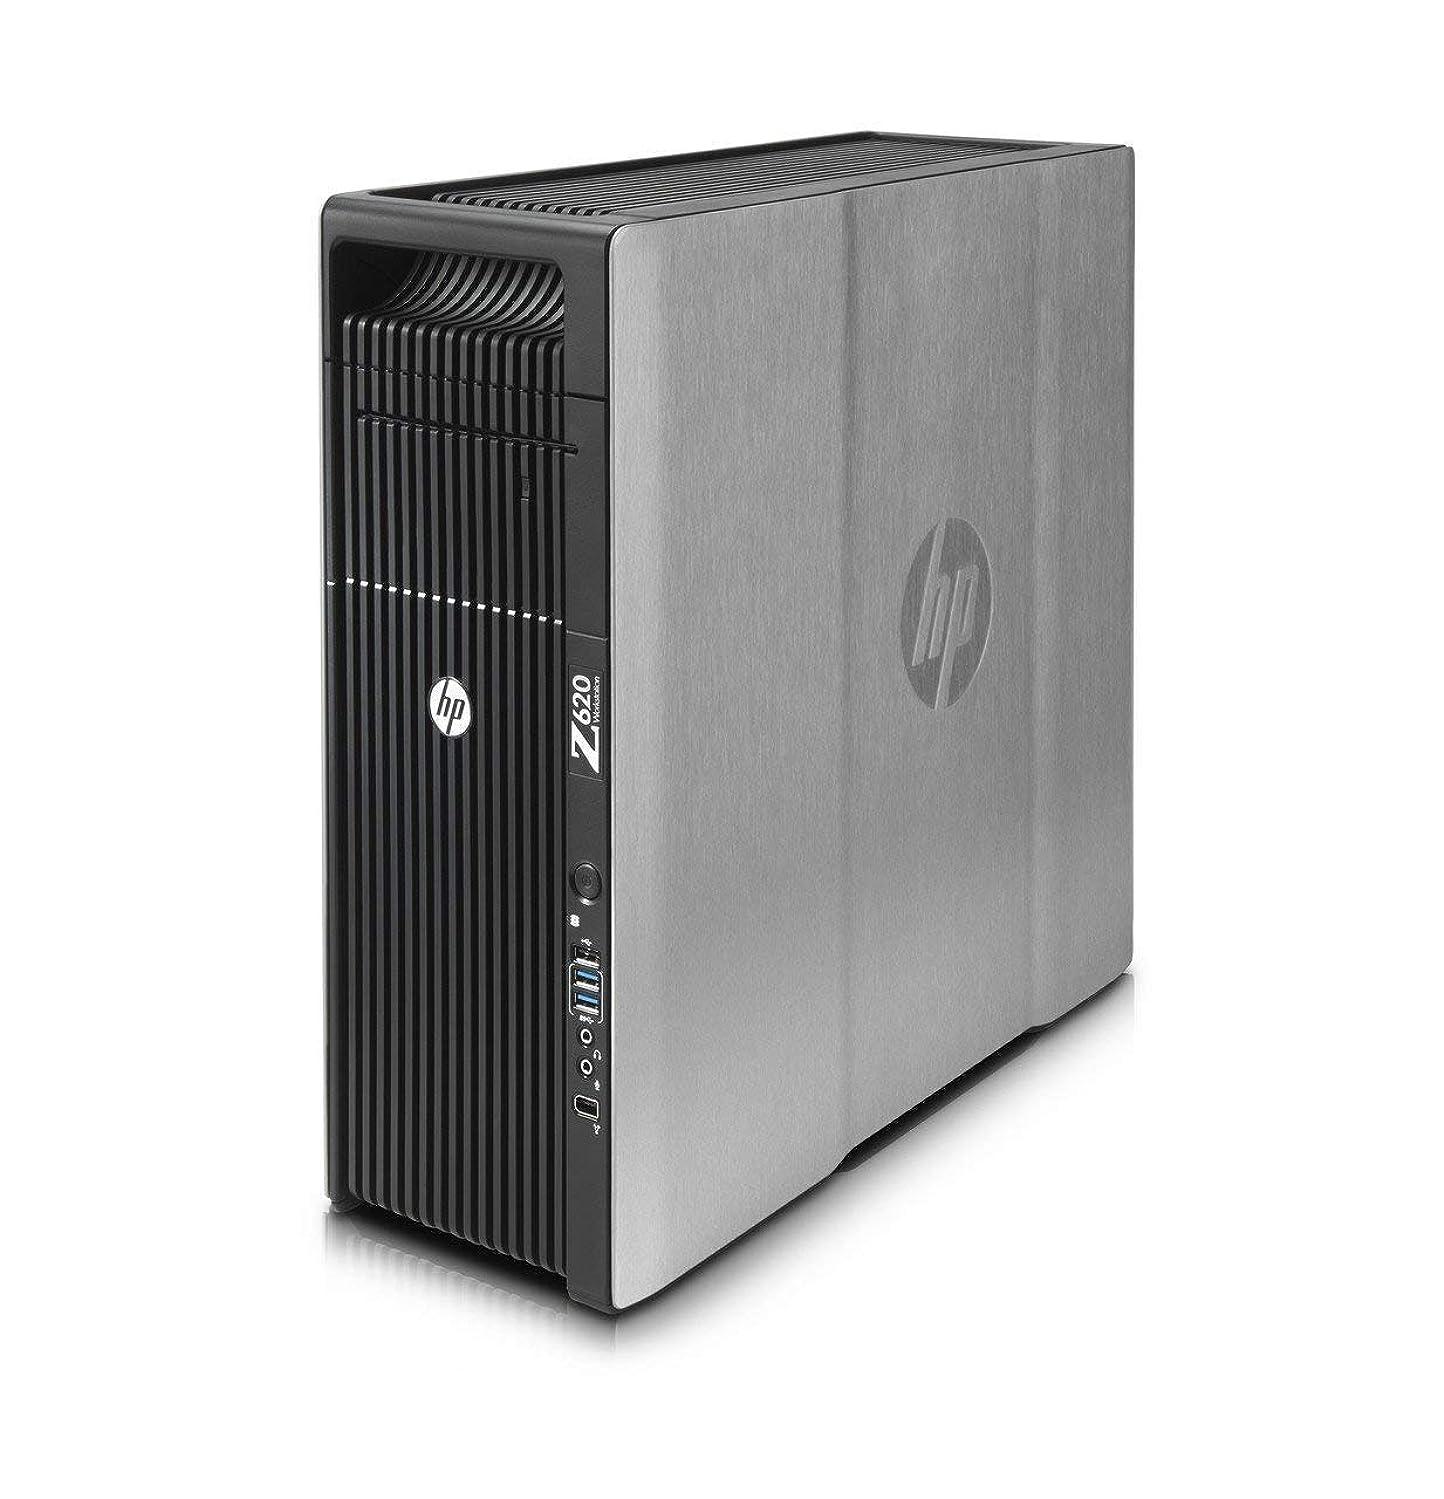 HP Z620 Workstation, 2x Intel Xeon E5-2670 2.6GHz Eight Core CPUs, 96GB memory, 256GB SSD, 1TB Hard Drive, NVIDIA Quadro 4000, Windows 7 Professional Installed (Renewed)